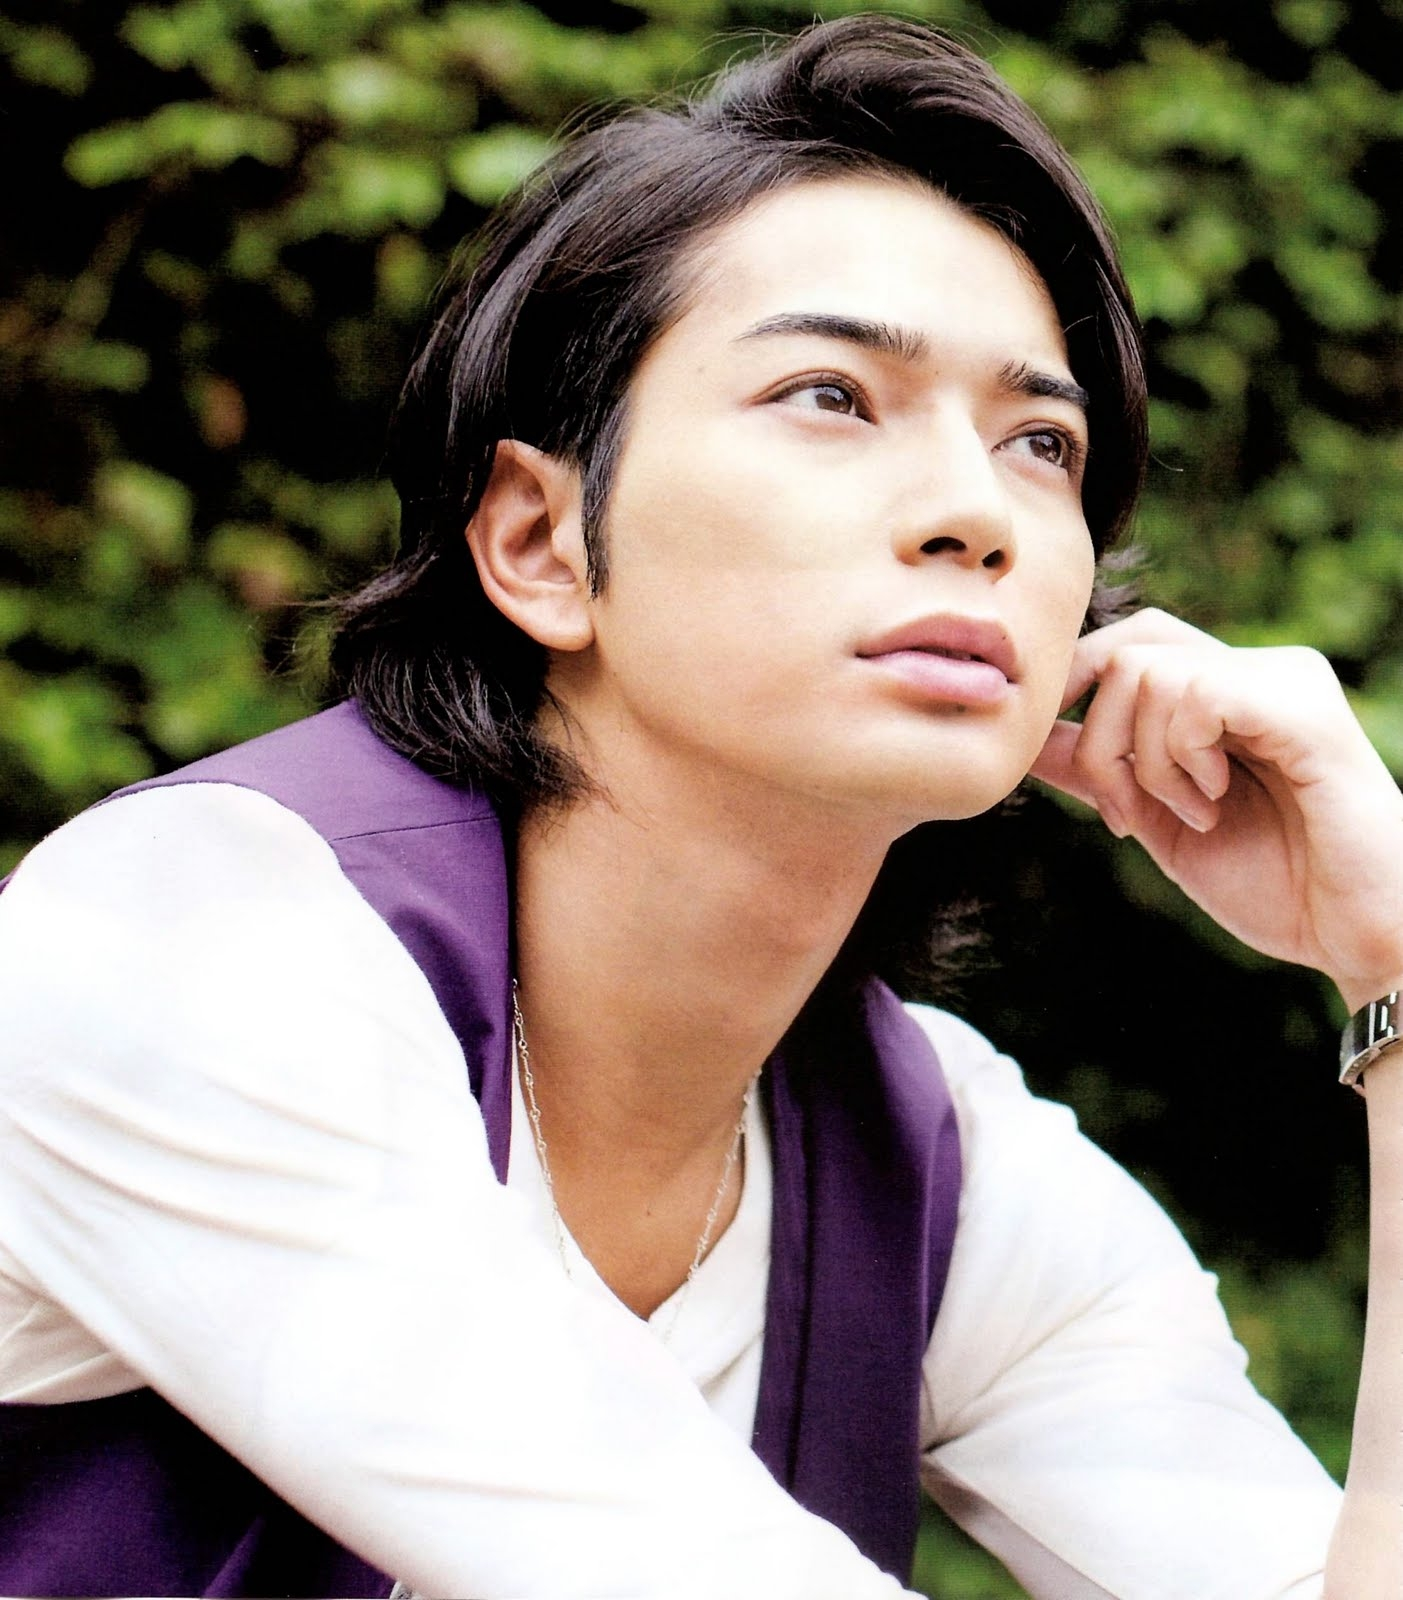 Японец гей